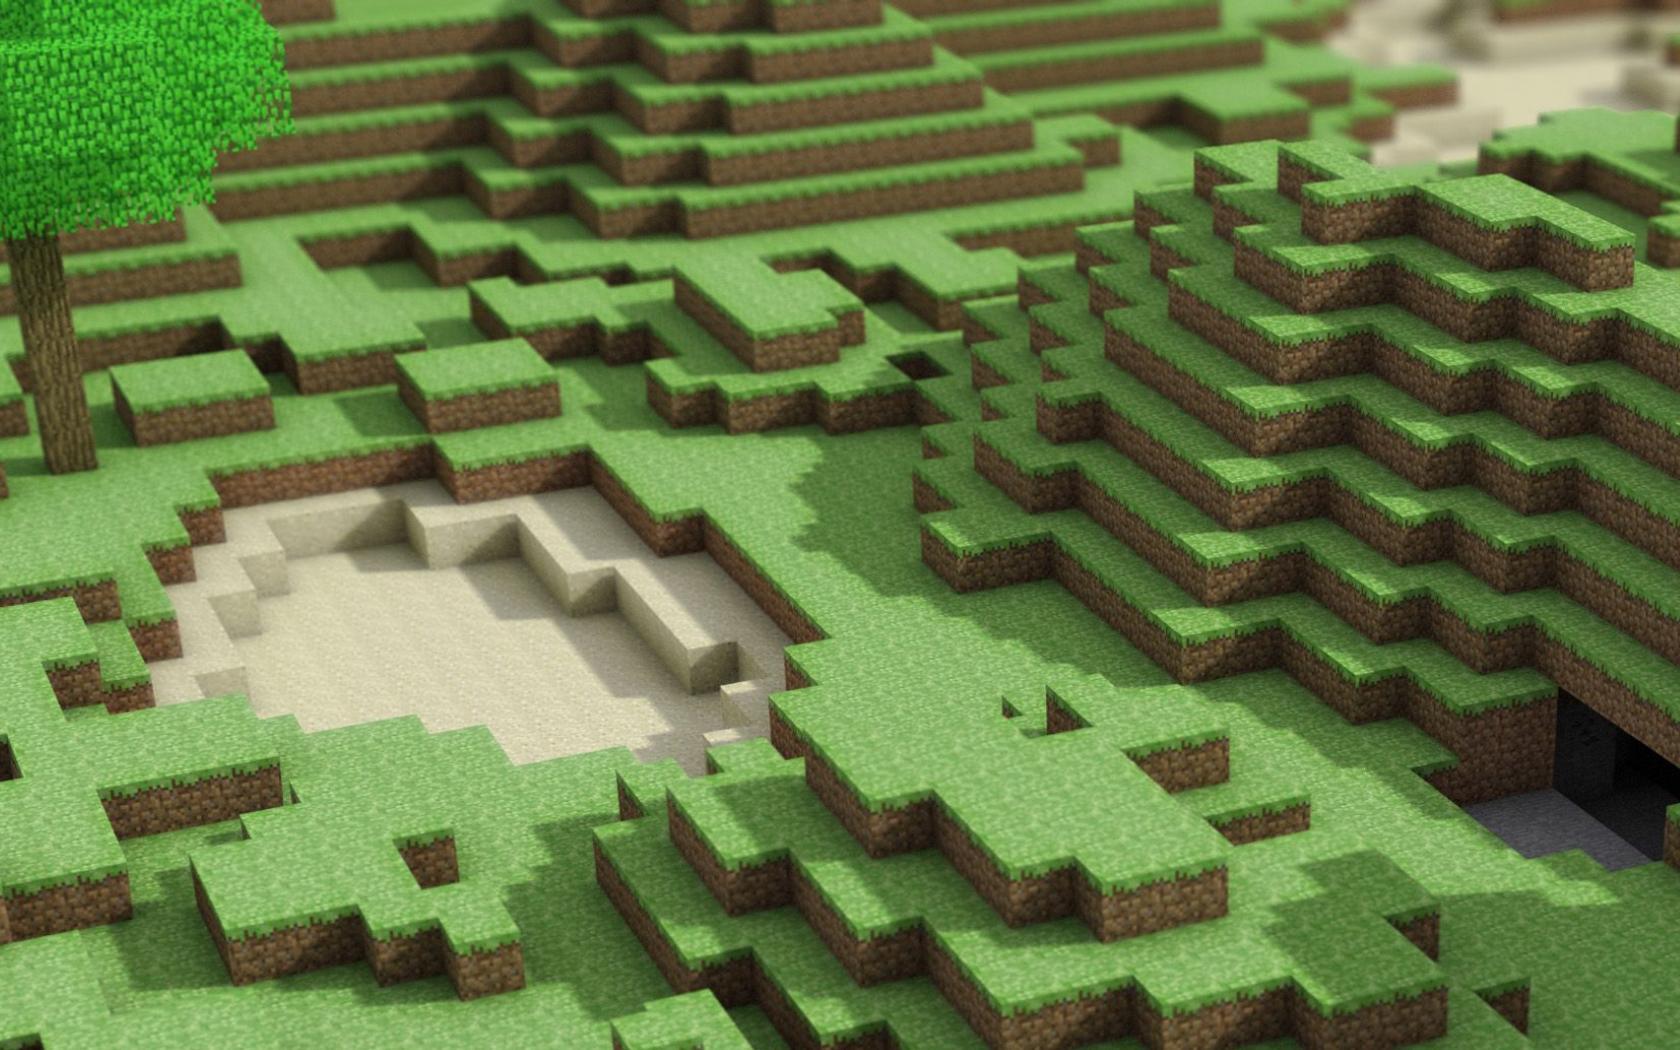 Minecraft Google Wallpapers Green Hills Minecraft Google Backgrounds 1680x1050